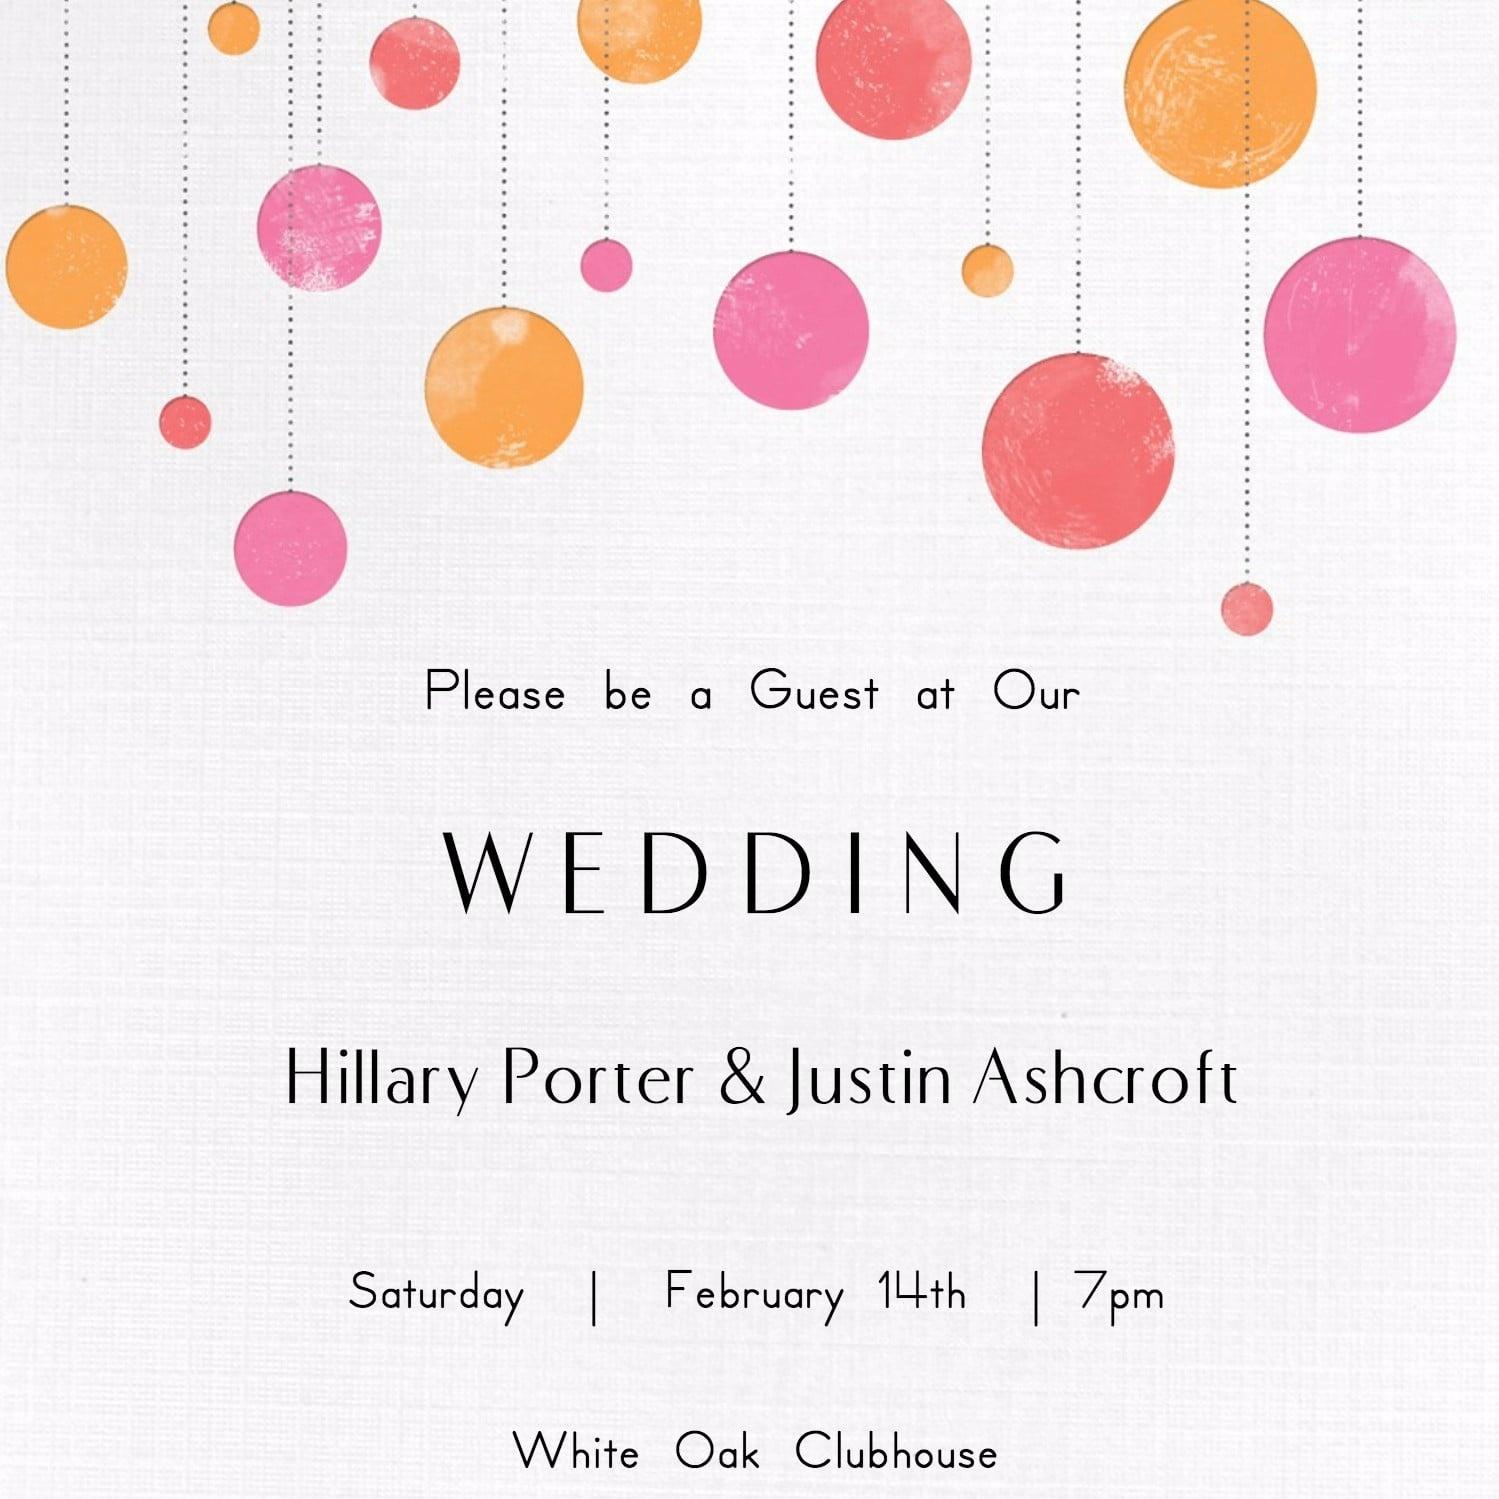 Free Printable Wedding Invitations | Popsugar Smart Living - Free Printable Wedding Invitations